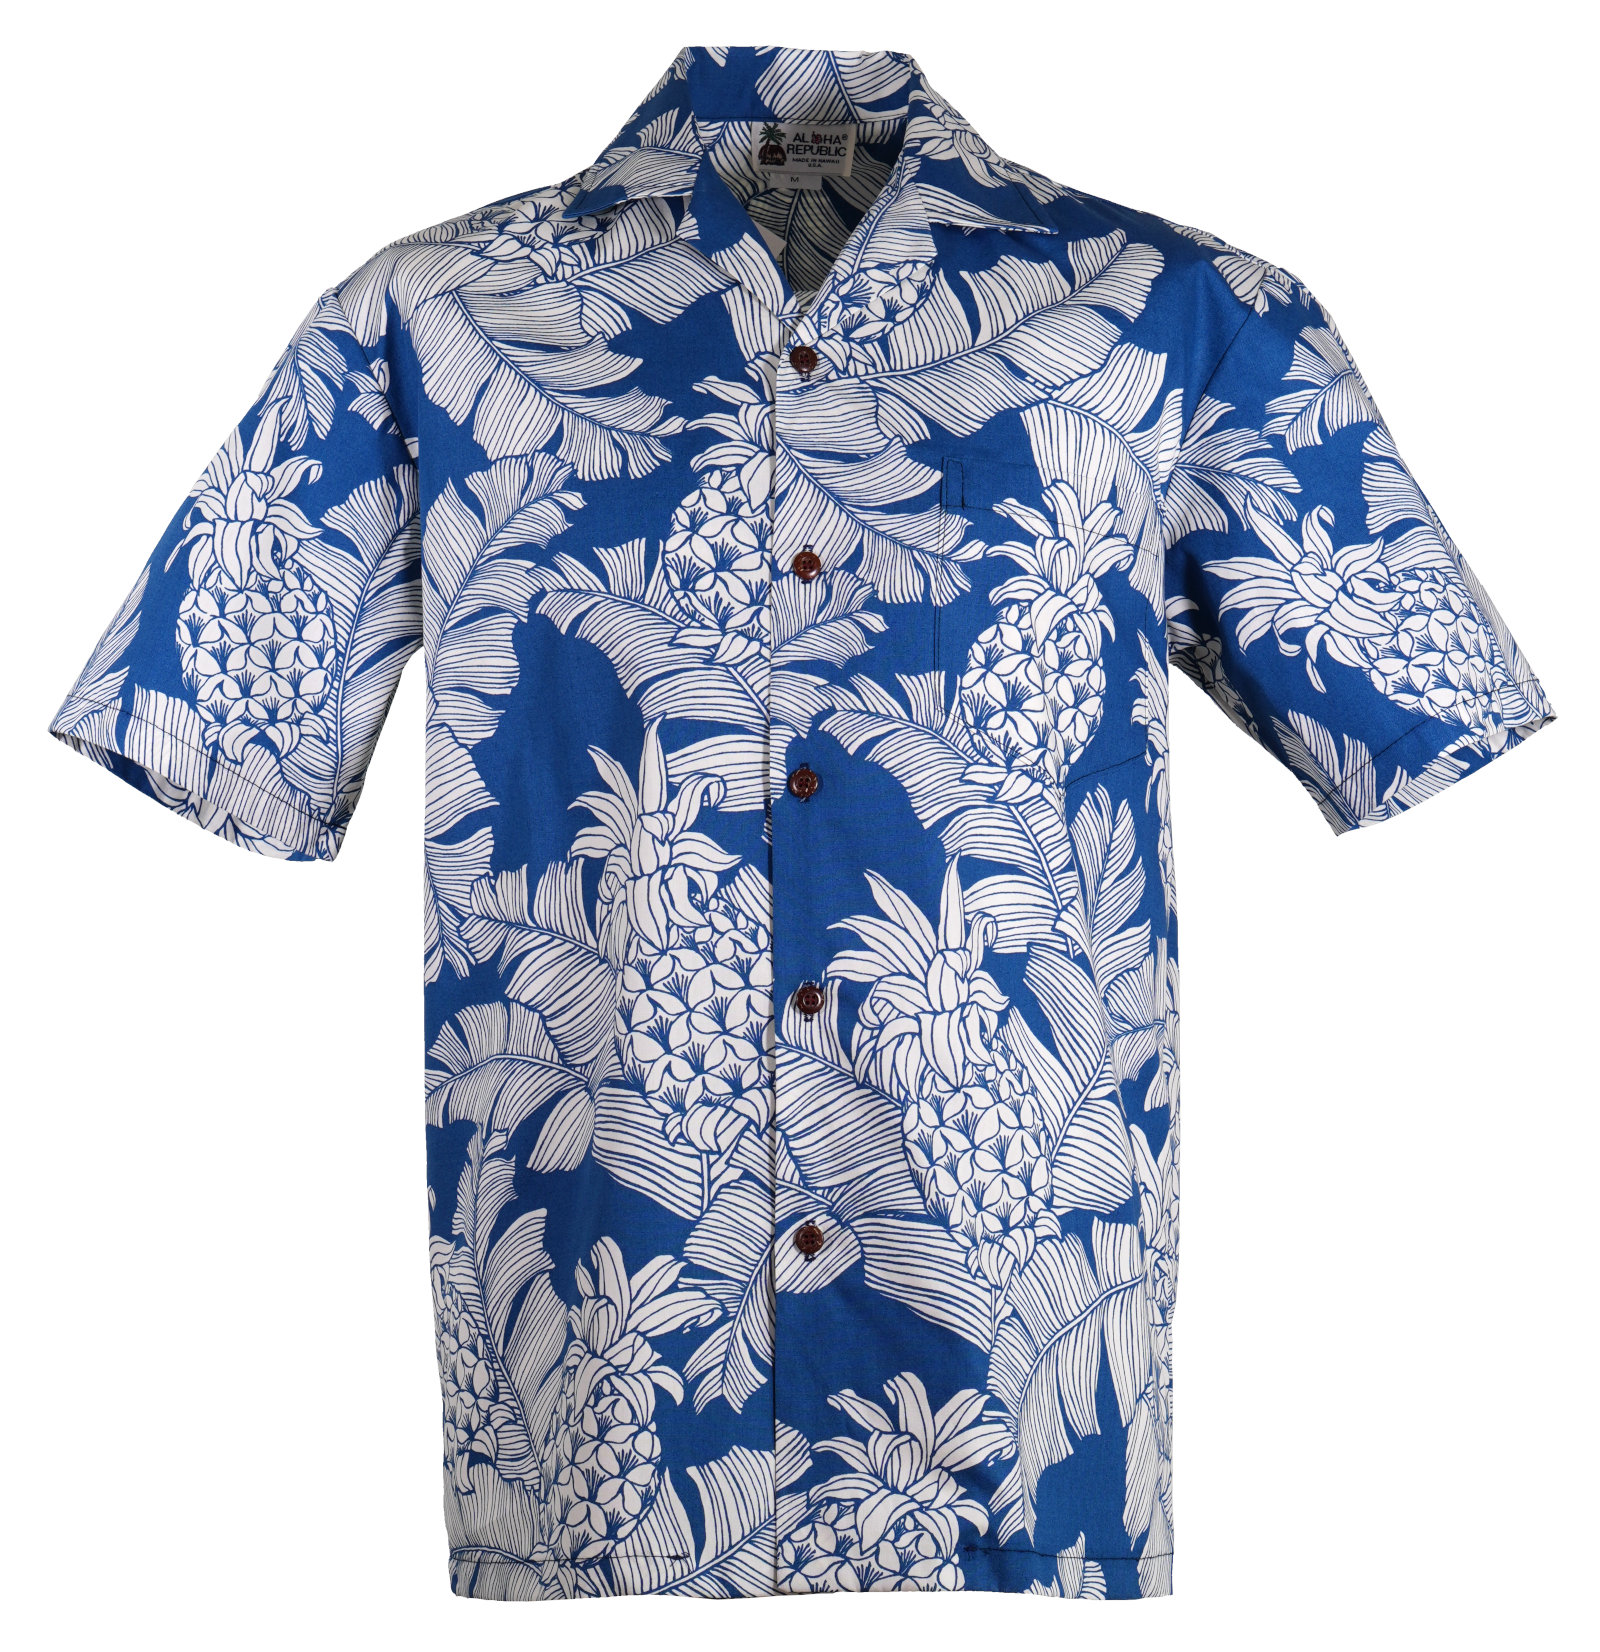 Original Hawaiihemd -VintagePina-